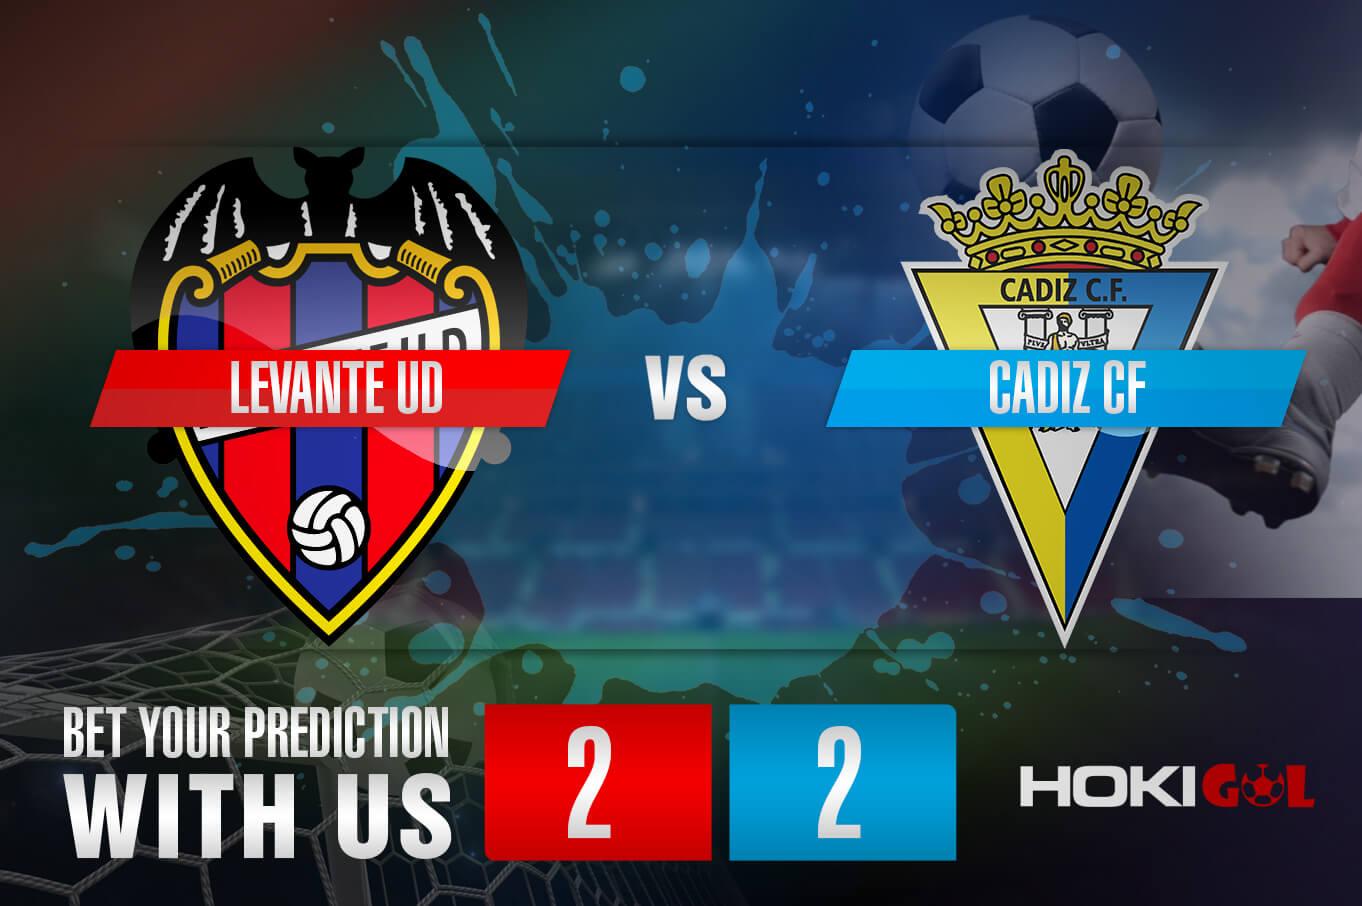 Prediksi Bola Levante UD Vc Cadiz CF 22 Mei 2021